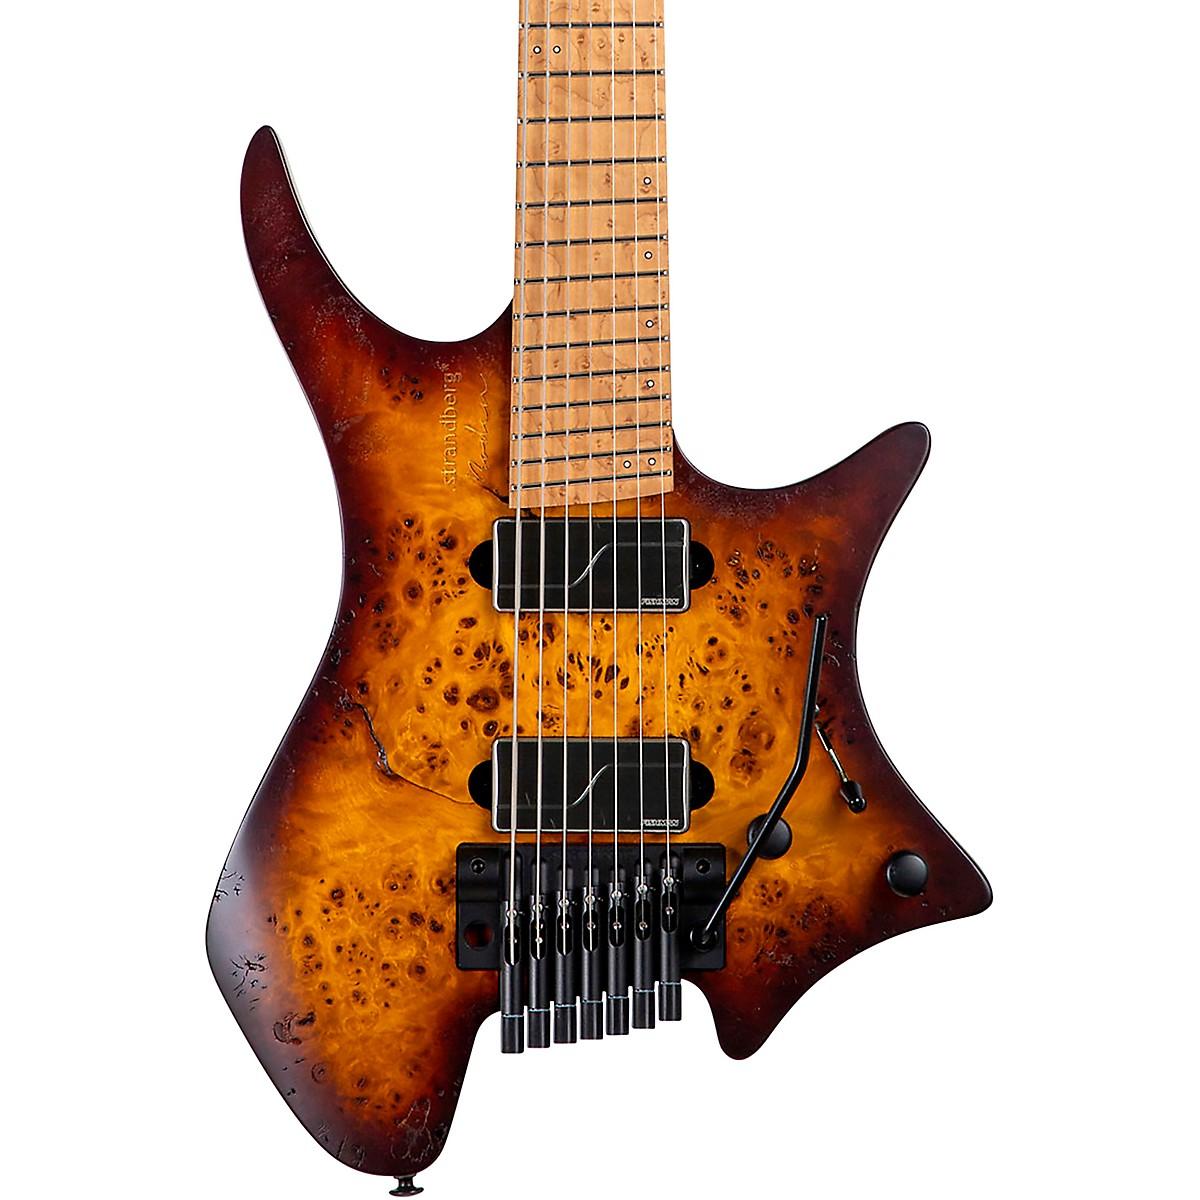 Strandberg Boden Original 7 Trem Poplar Burl Electric Guitar